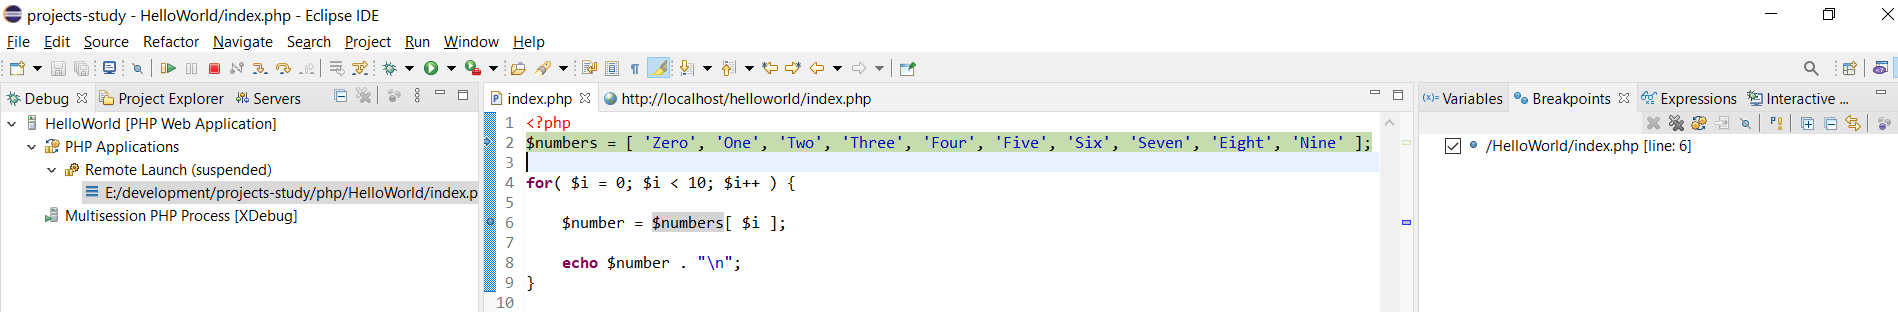 Remote Debug PHP on Windows using Eclipse - Debug Perspective